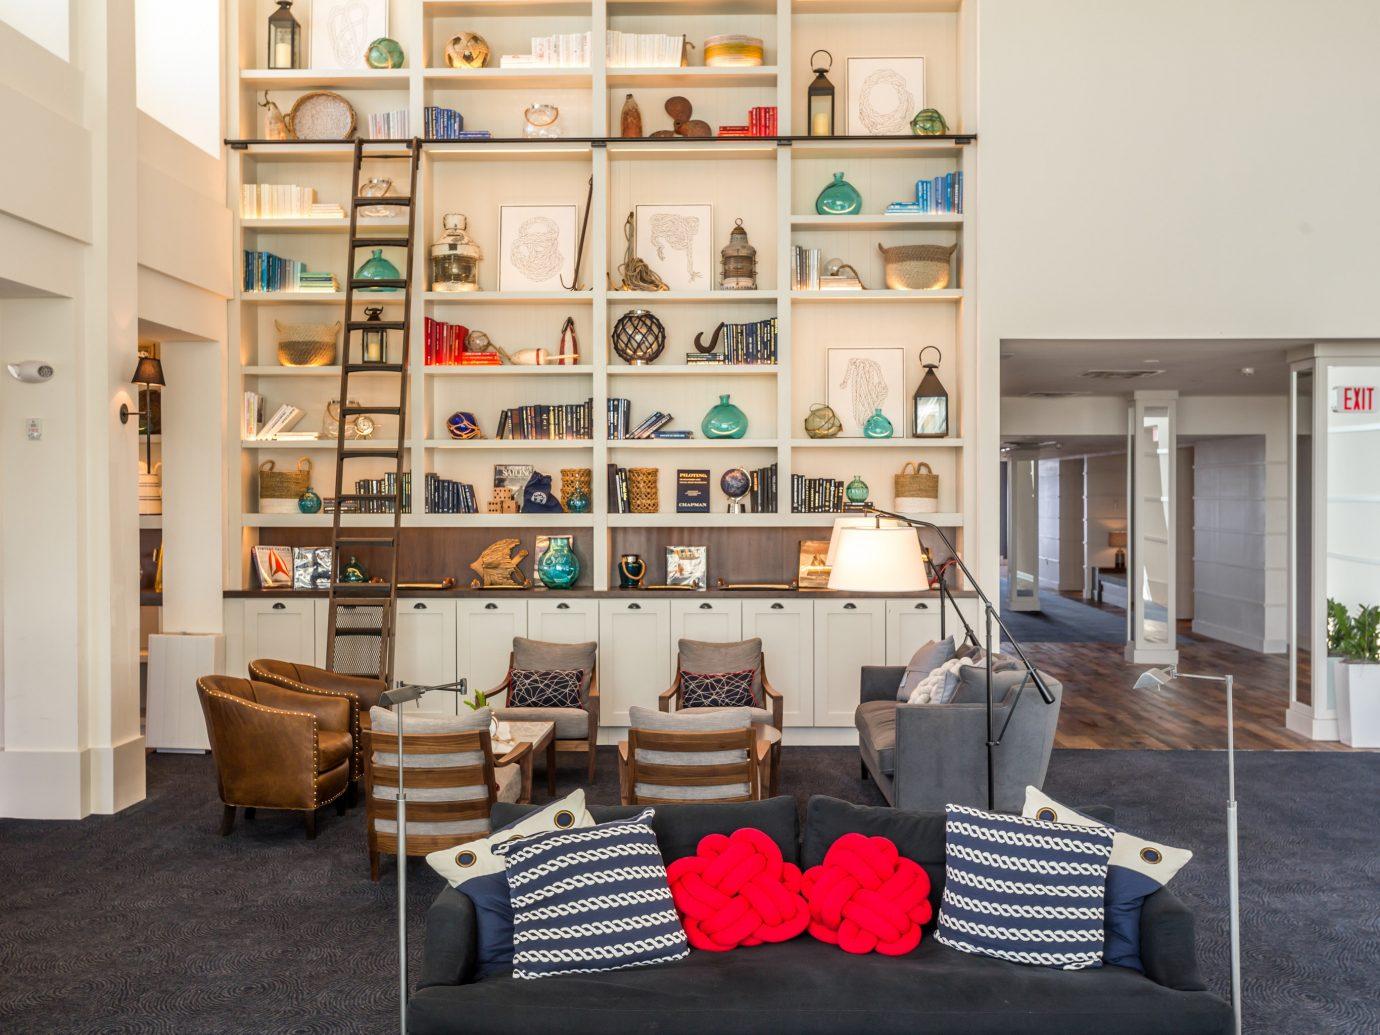 Hotels indoor floor property room living room home interior design furniture Design real estate condominium window covering